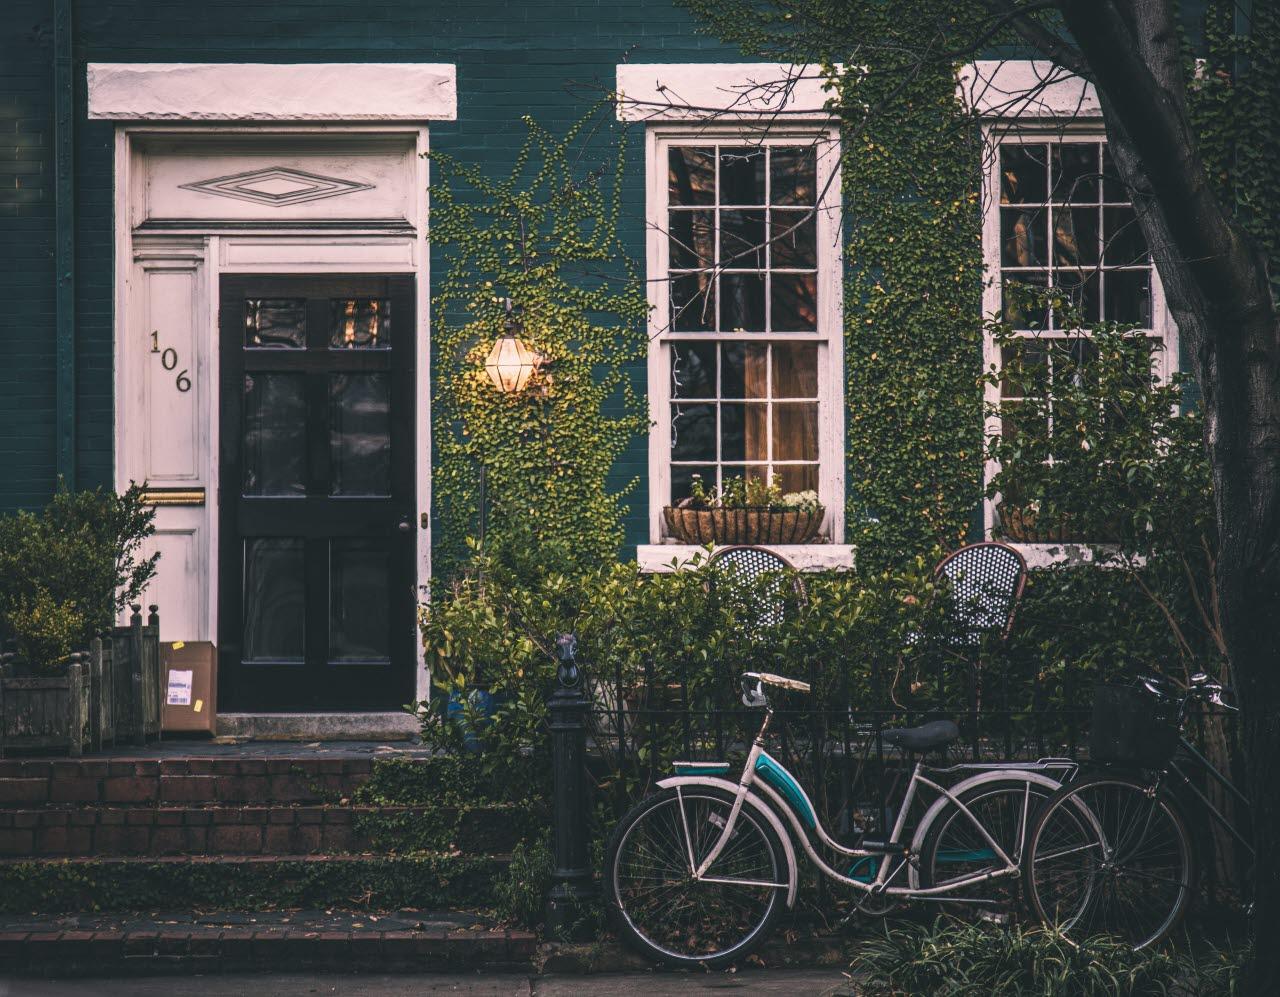 House with bike